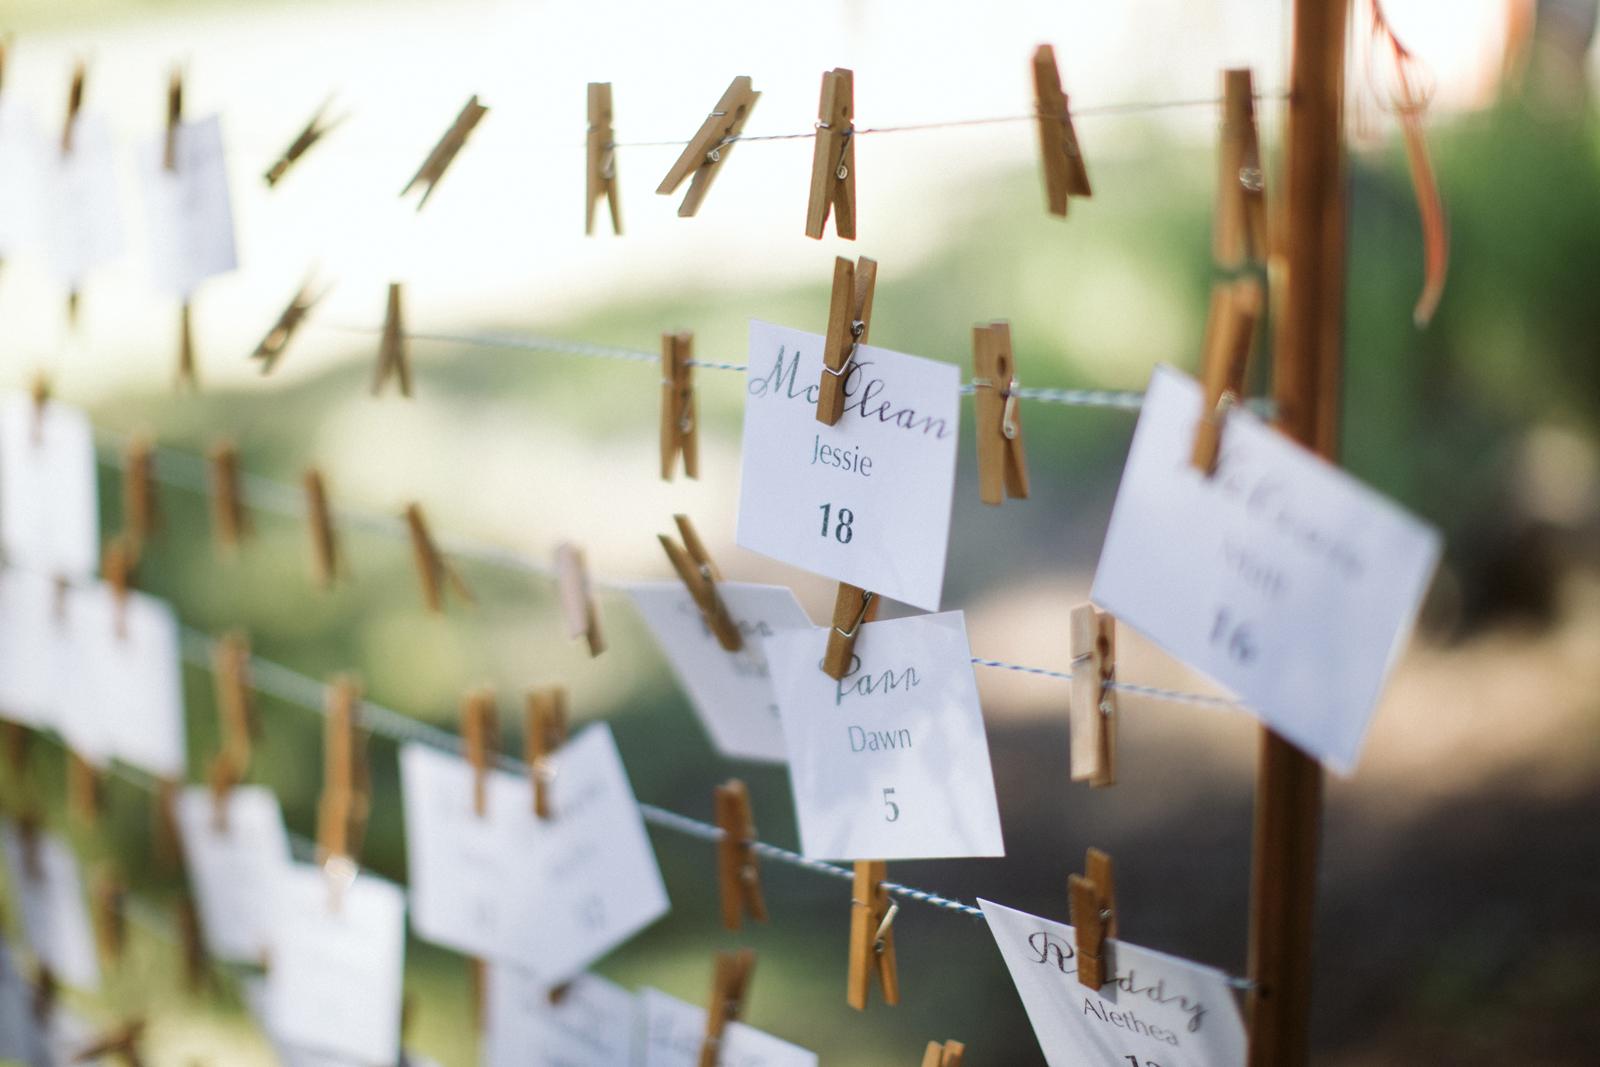 075-daronjackson-rachel-michael-wedding-mtpisgah.jpg